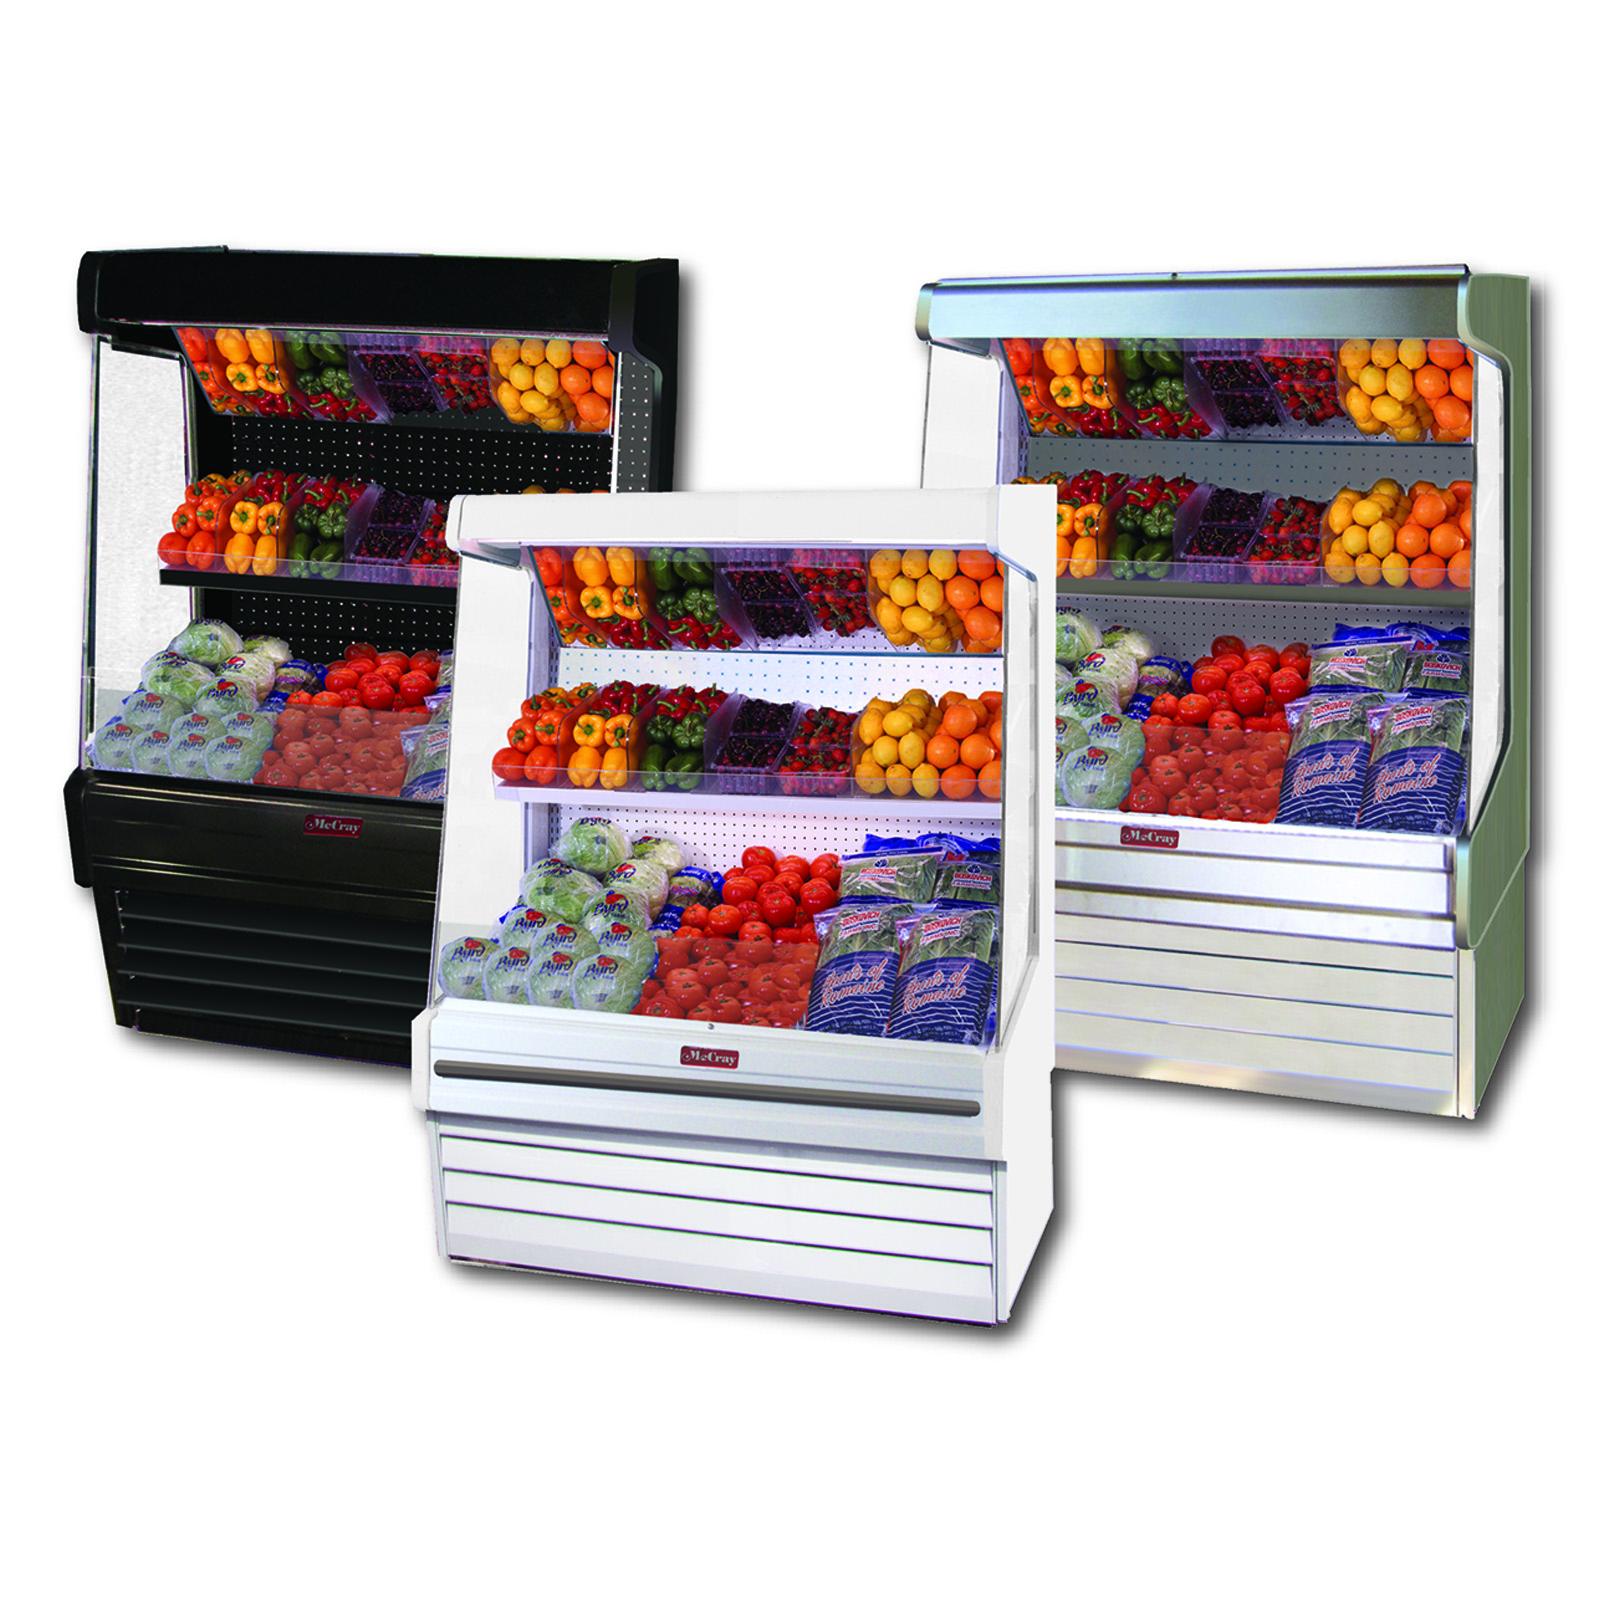 Howard-McCray SC-OP30E-6-S-LED display case, produce